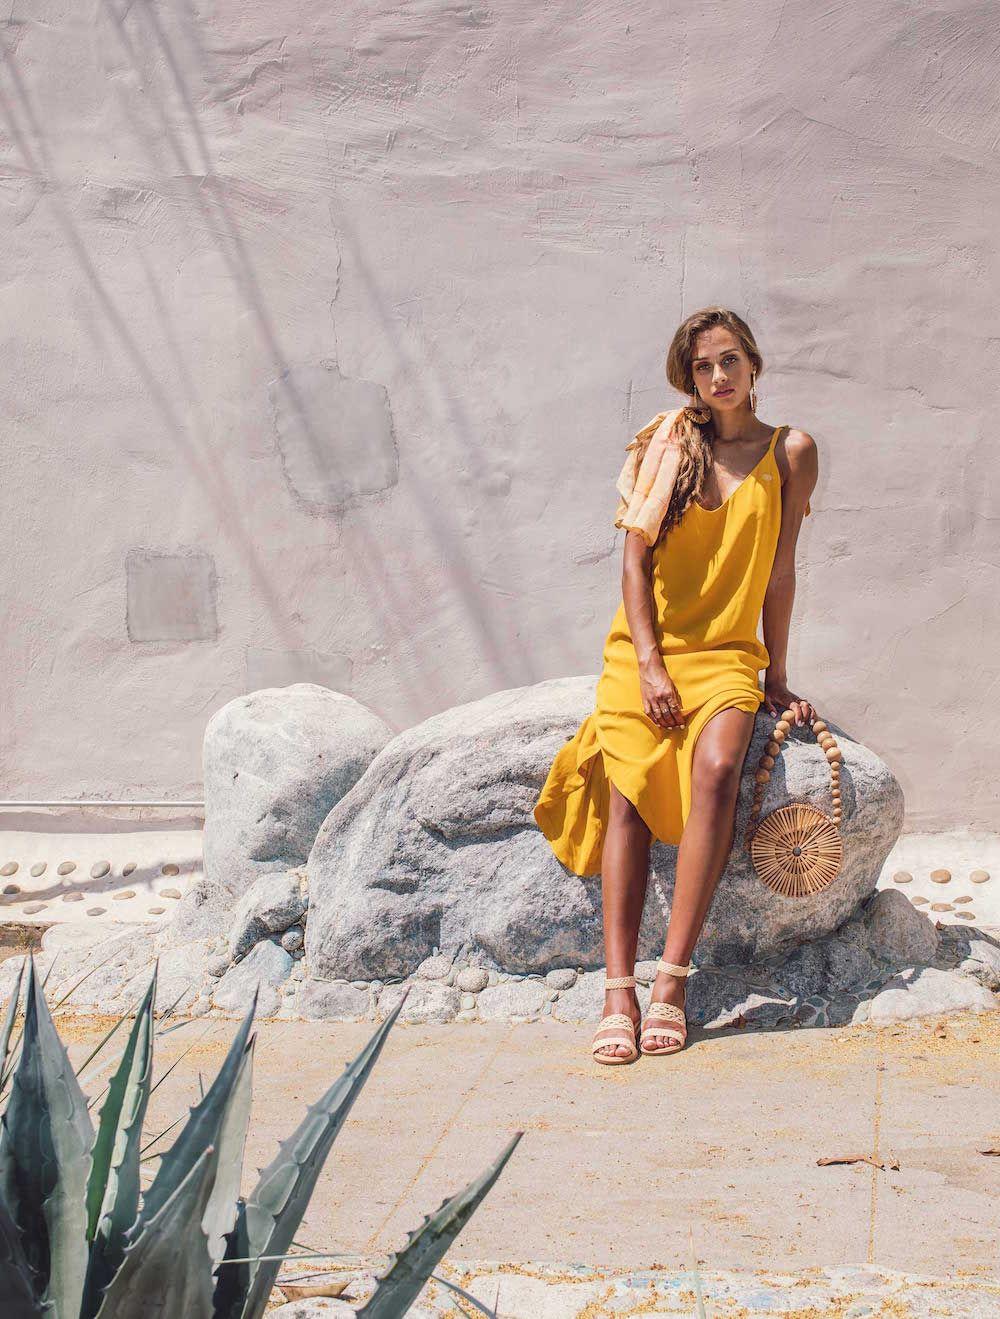 Bared_Footwear_Womens_Linnet_Cream_Nubuck_Sandals_Yellow_Dress_LA_Summer